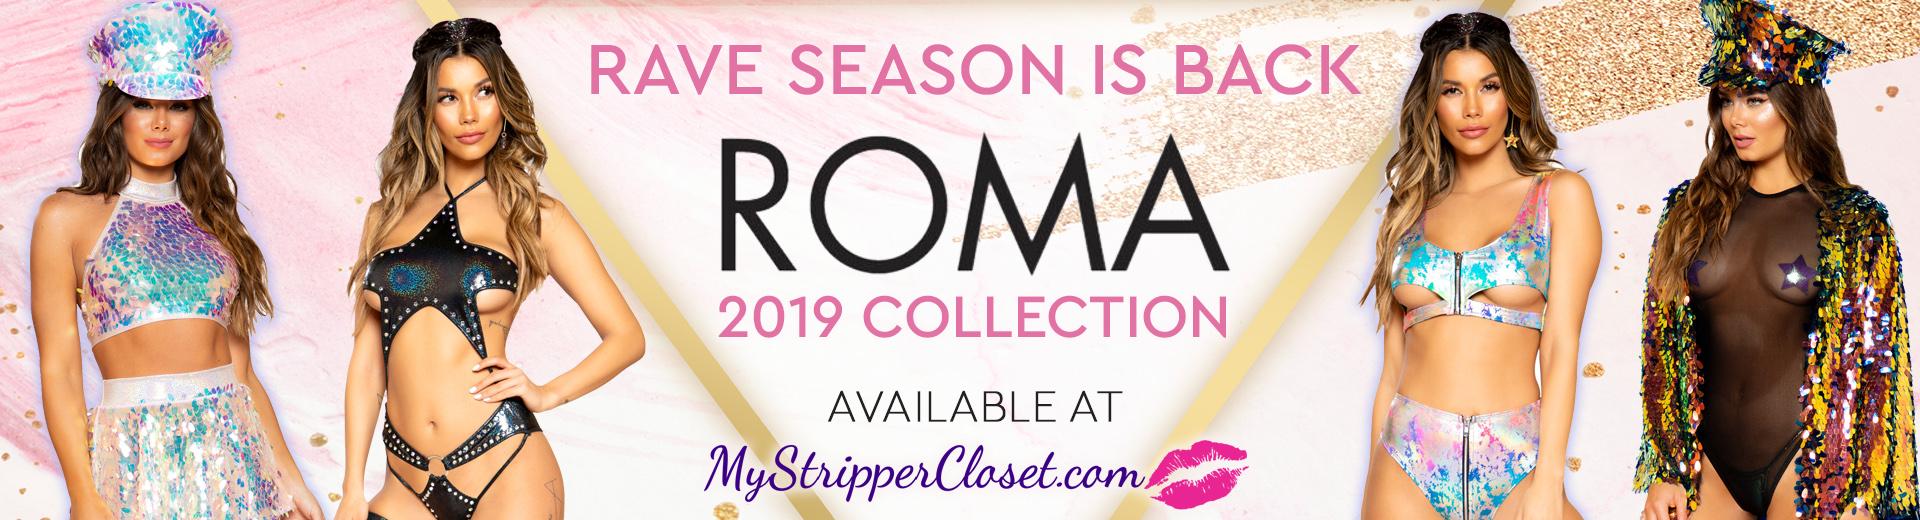 New Roma Ravewear 2019 mystrippercloset.com